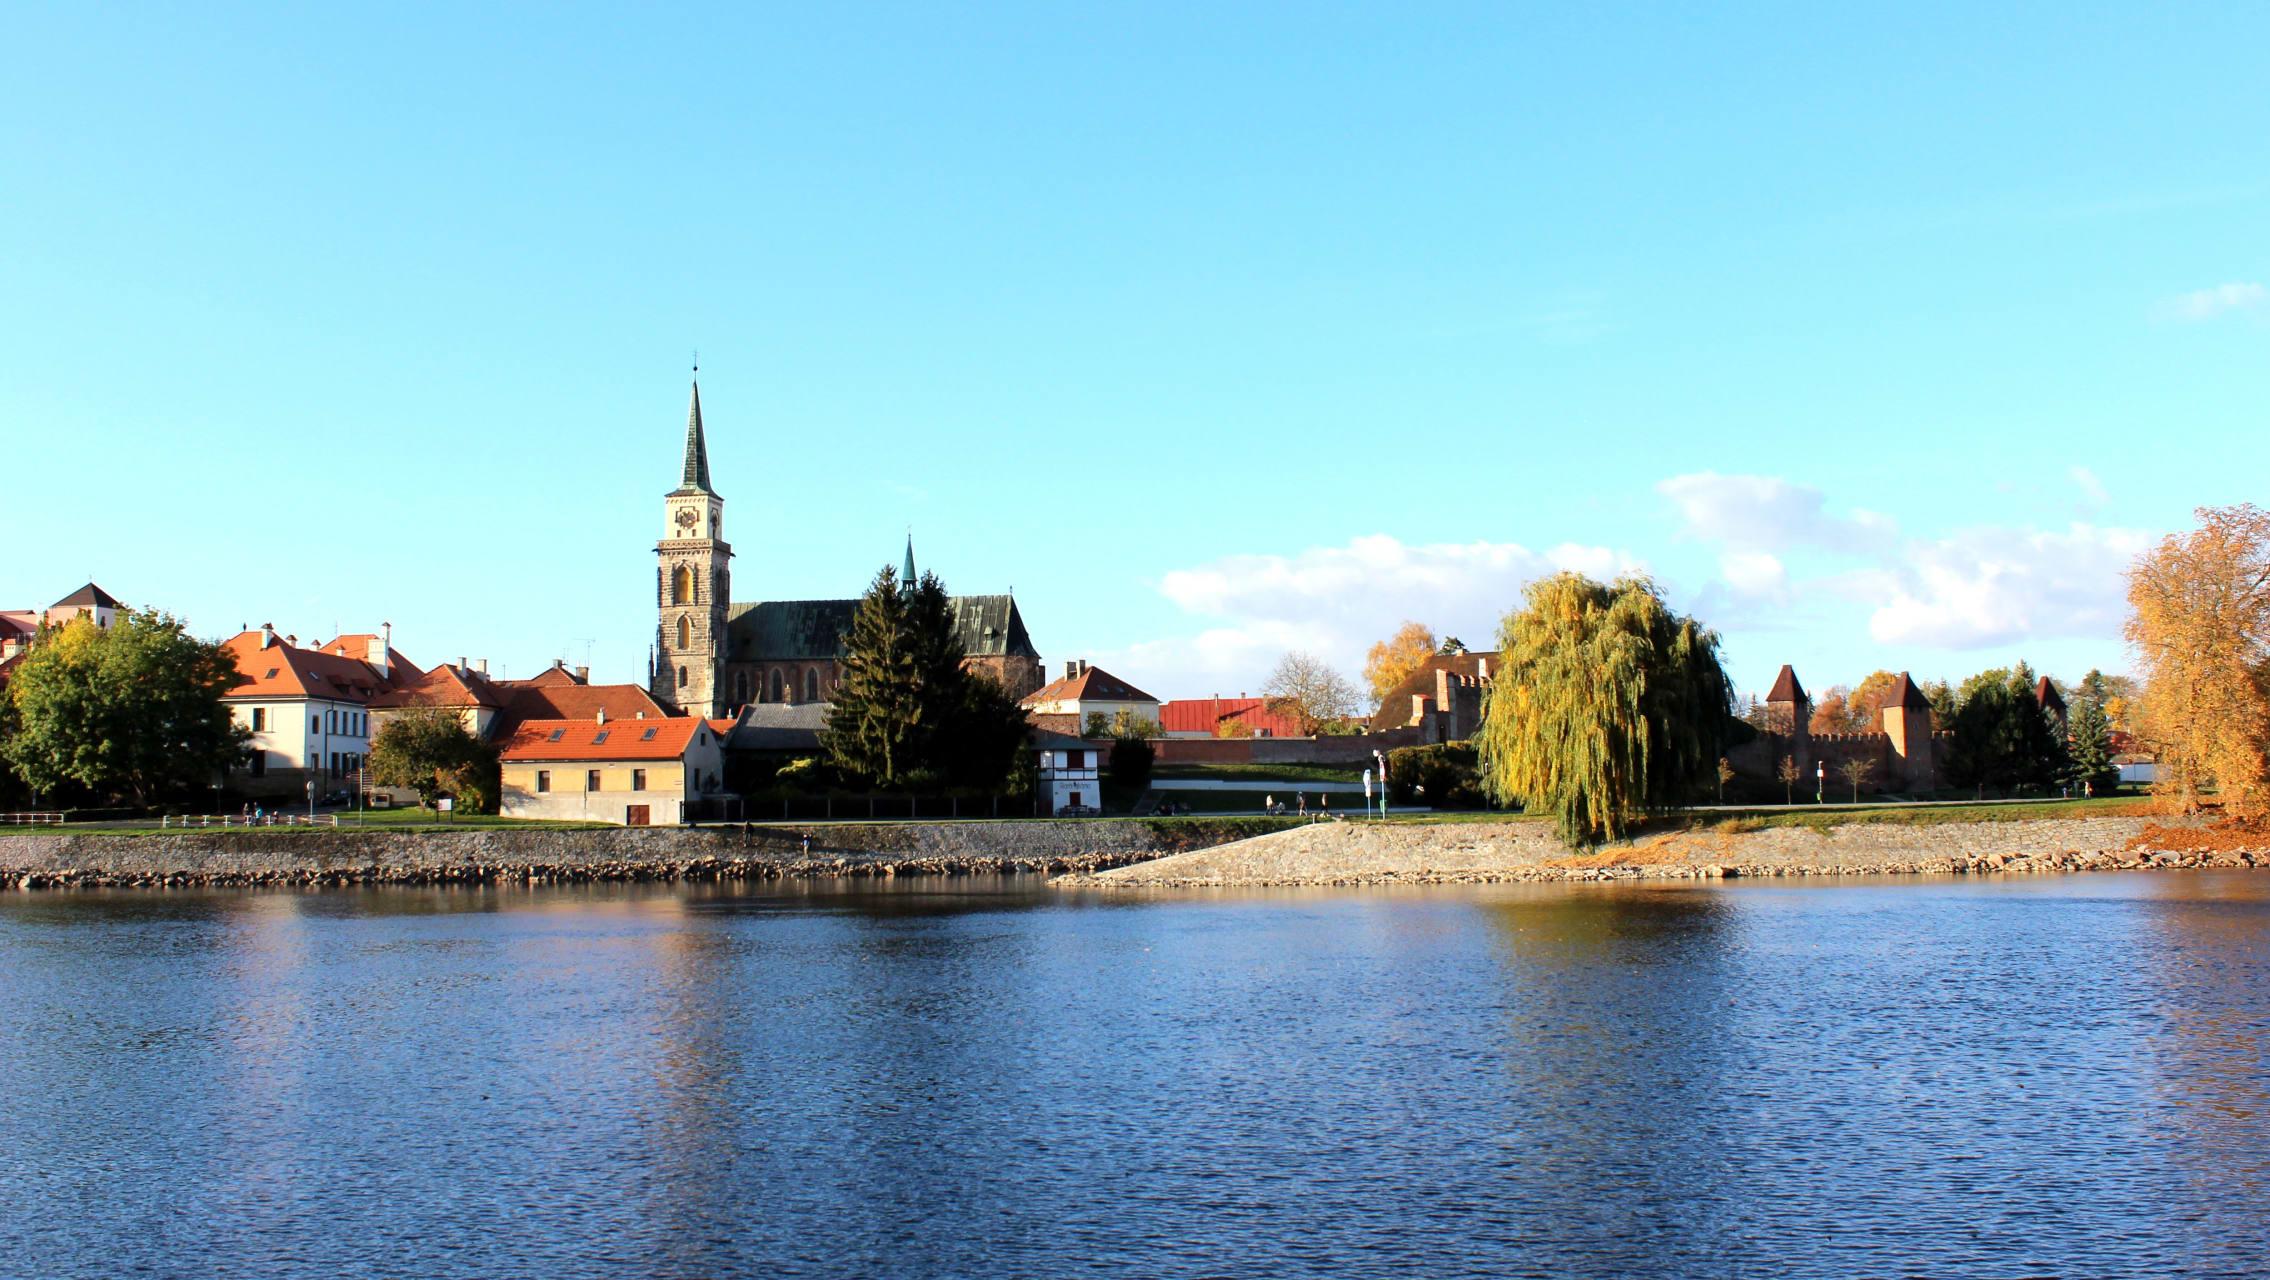 Nymburk - Discover a Czech Royal Town NYMBURK with Pavla